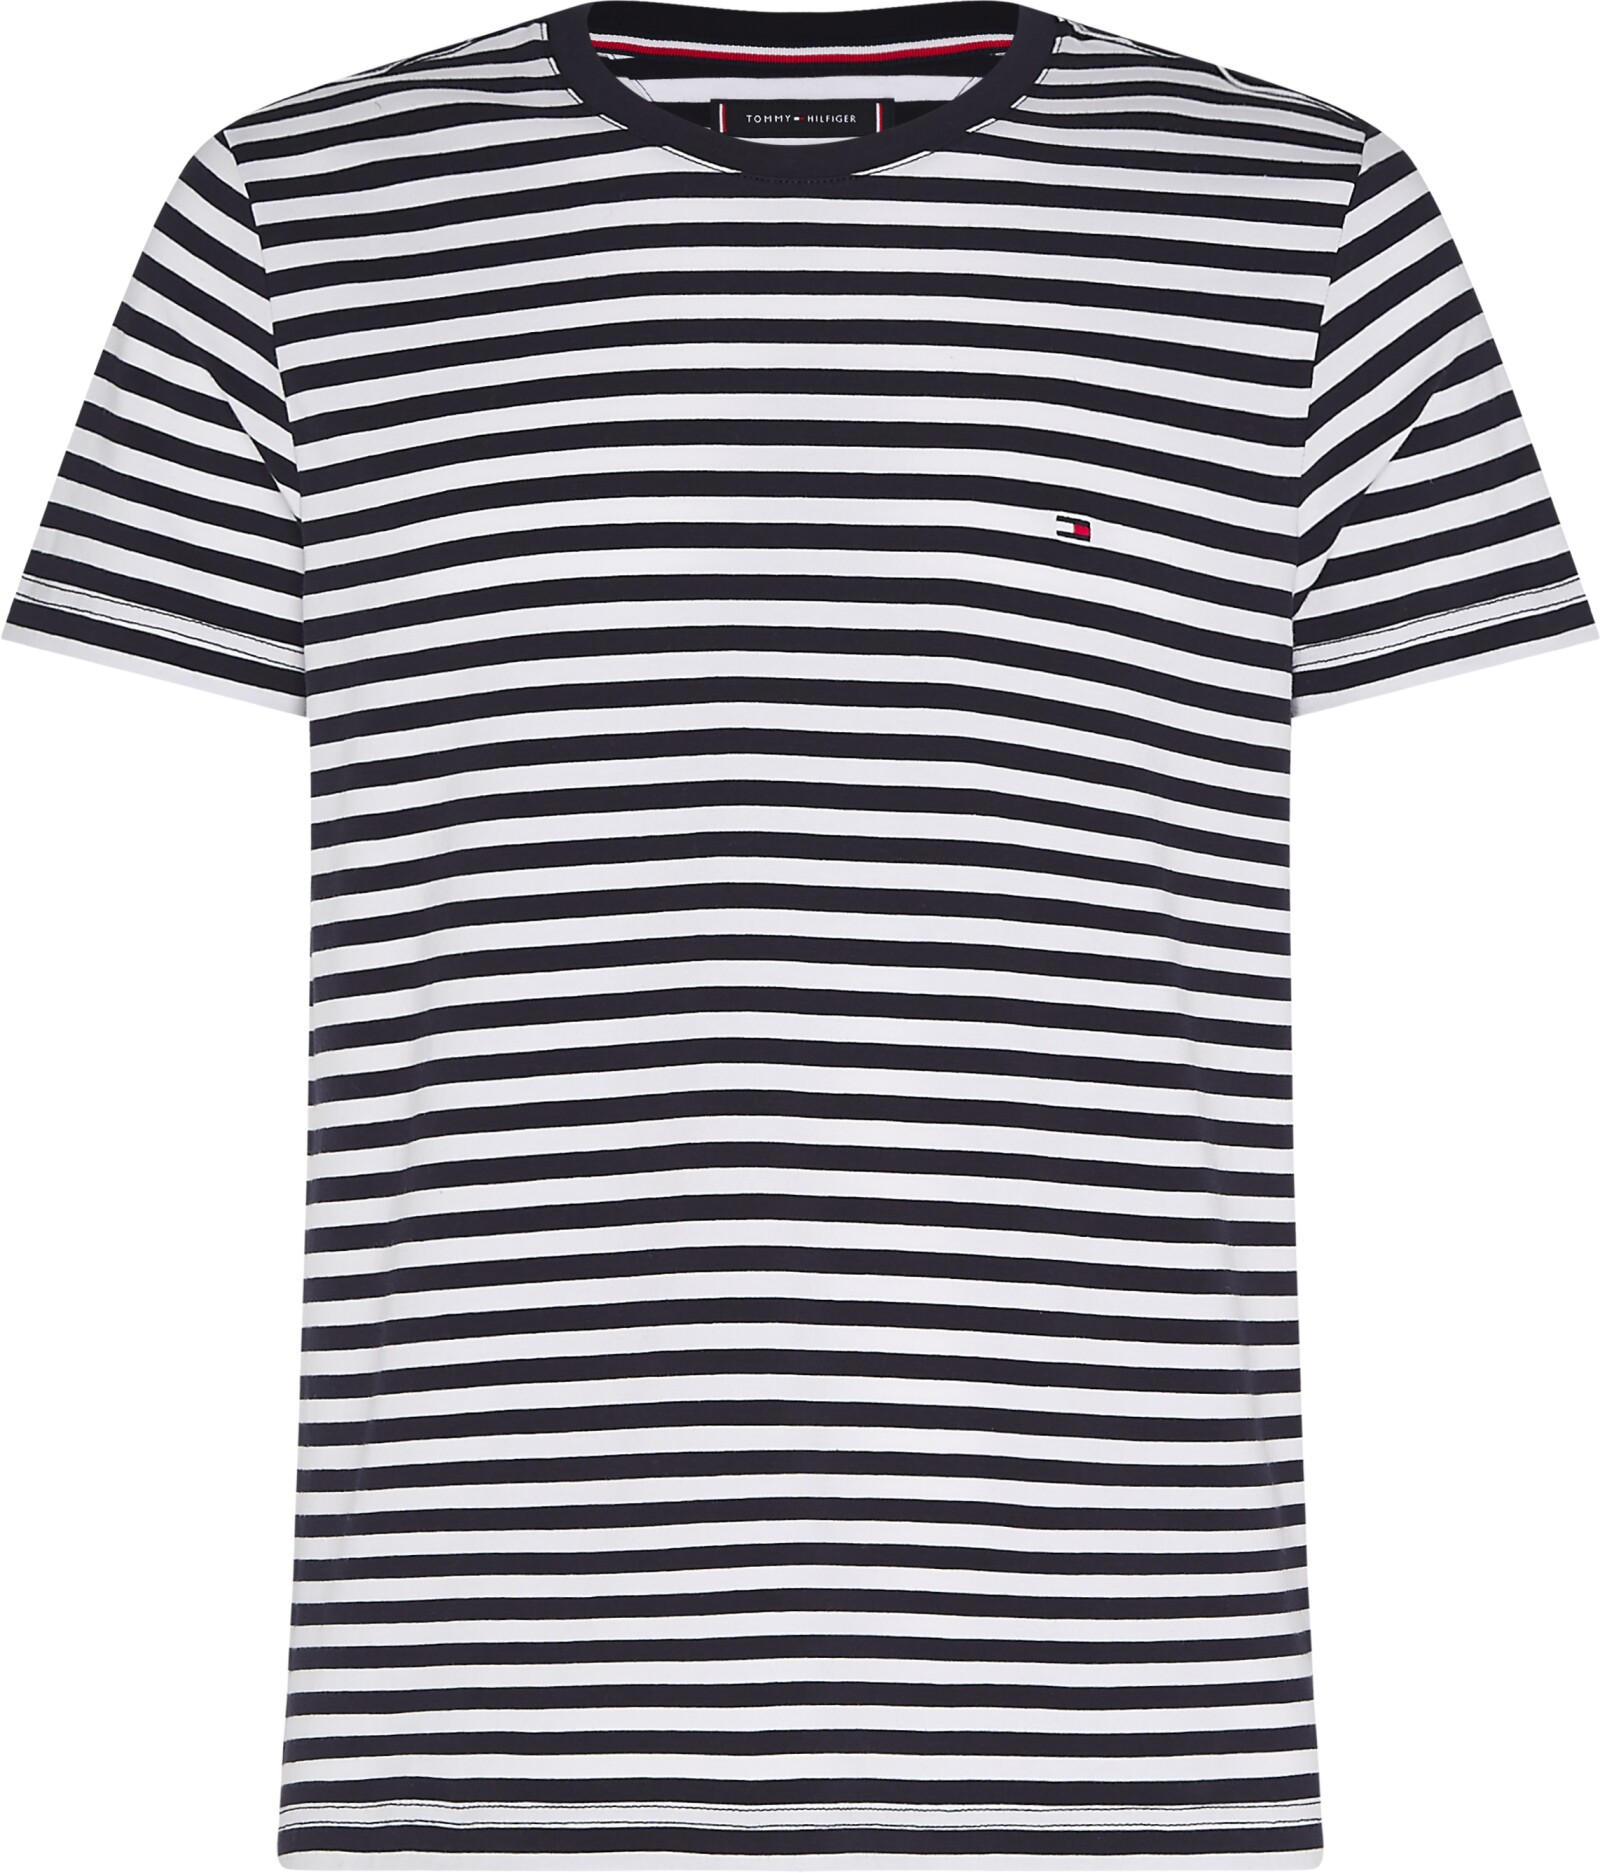 camiseta de algodón orgánico.jpg